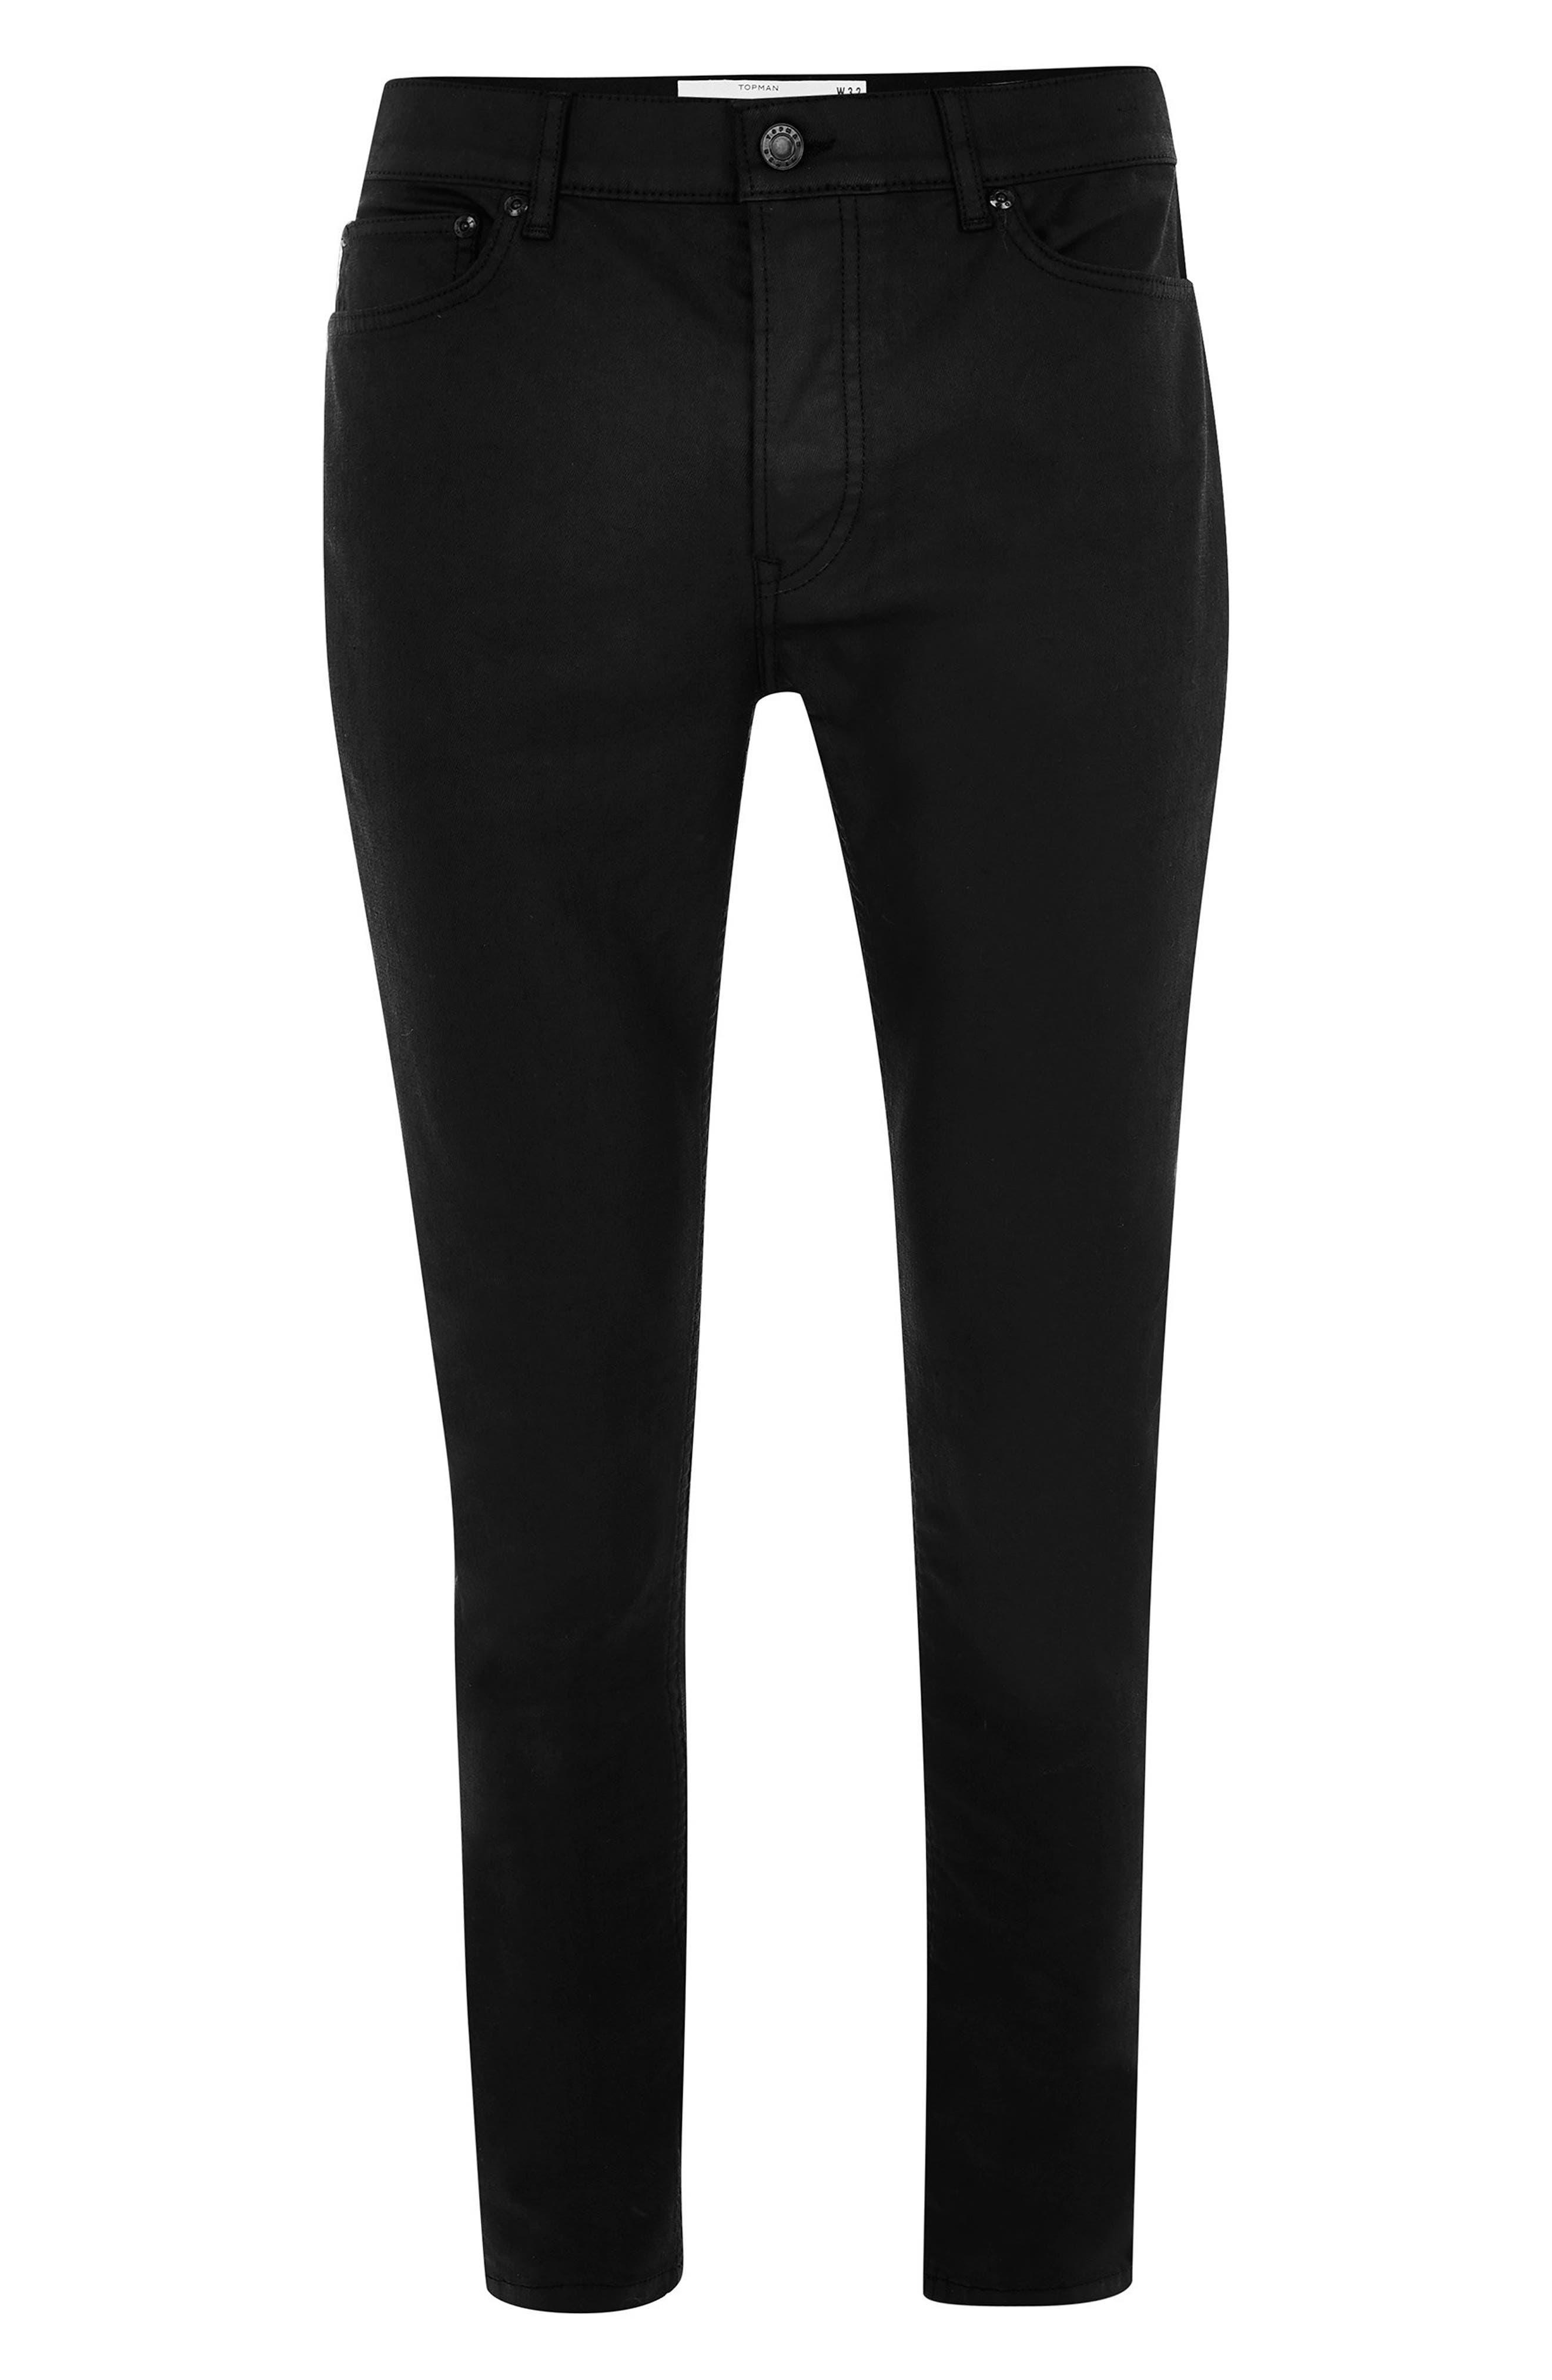 TOPMAN, Coated Denim Skinny Jeans, Alternate thumbnail 5, color, BLACK